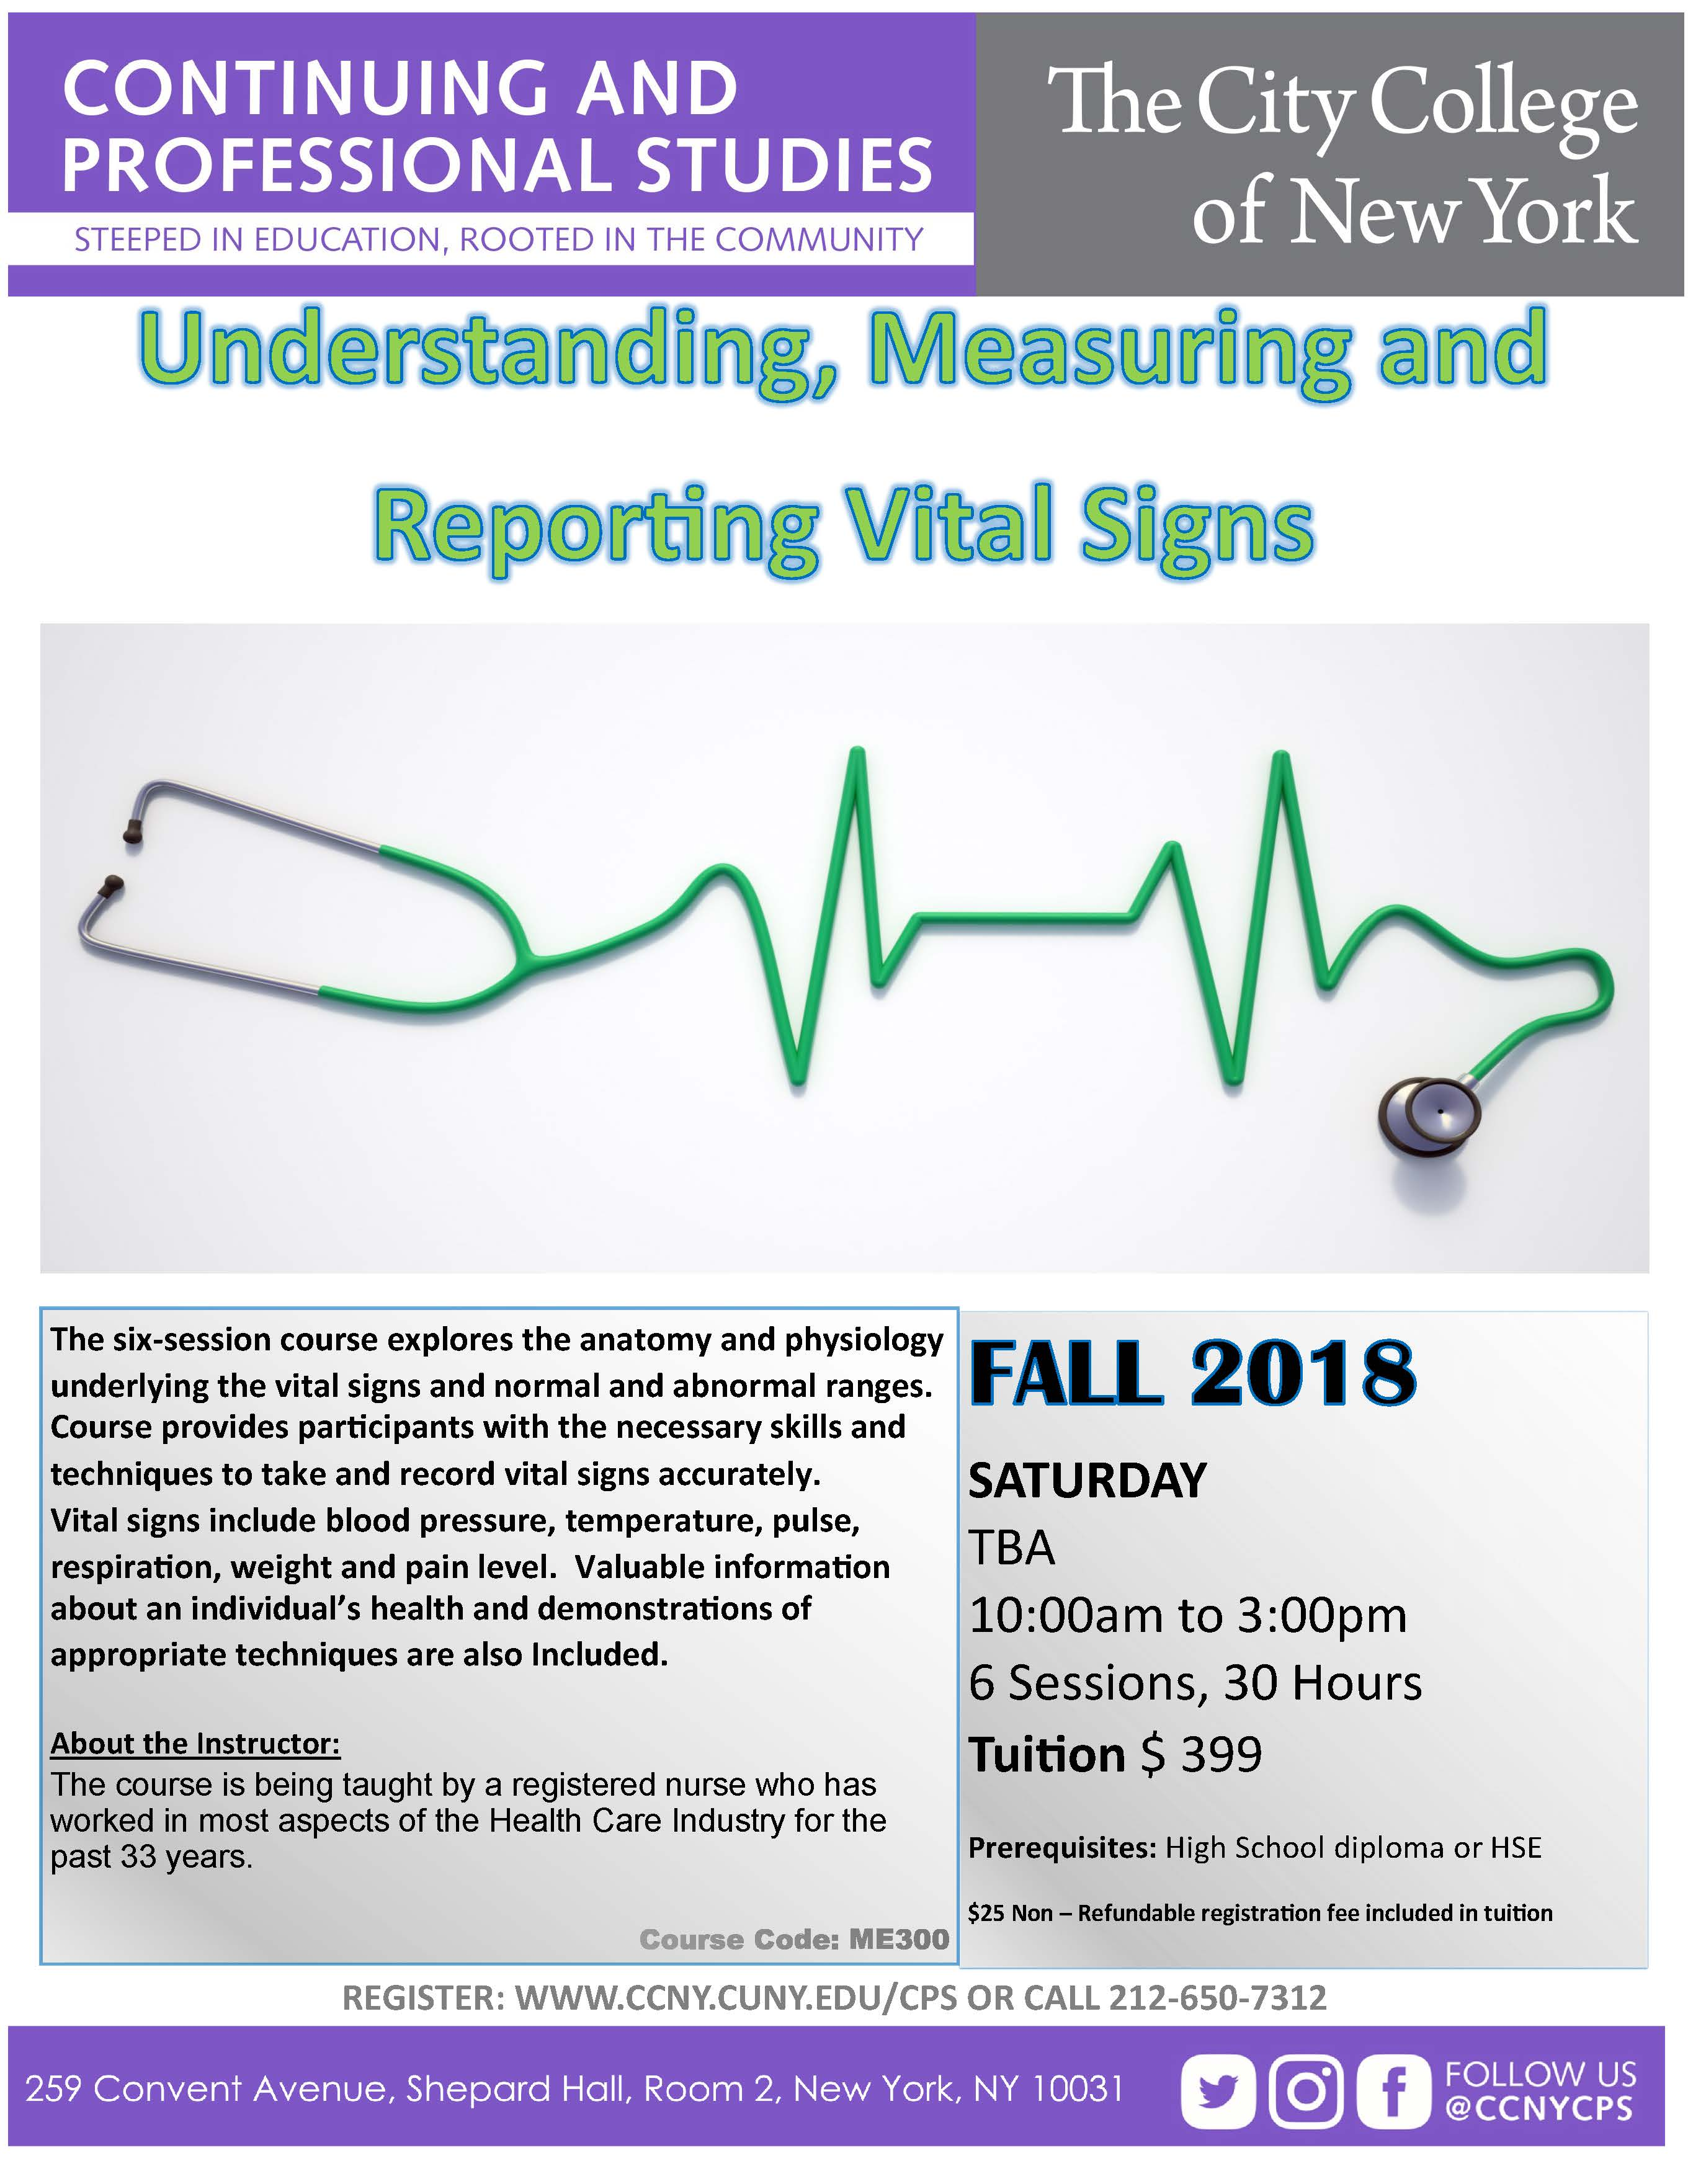 Reporting Vital Signs Fall 2018